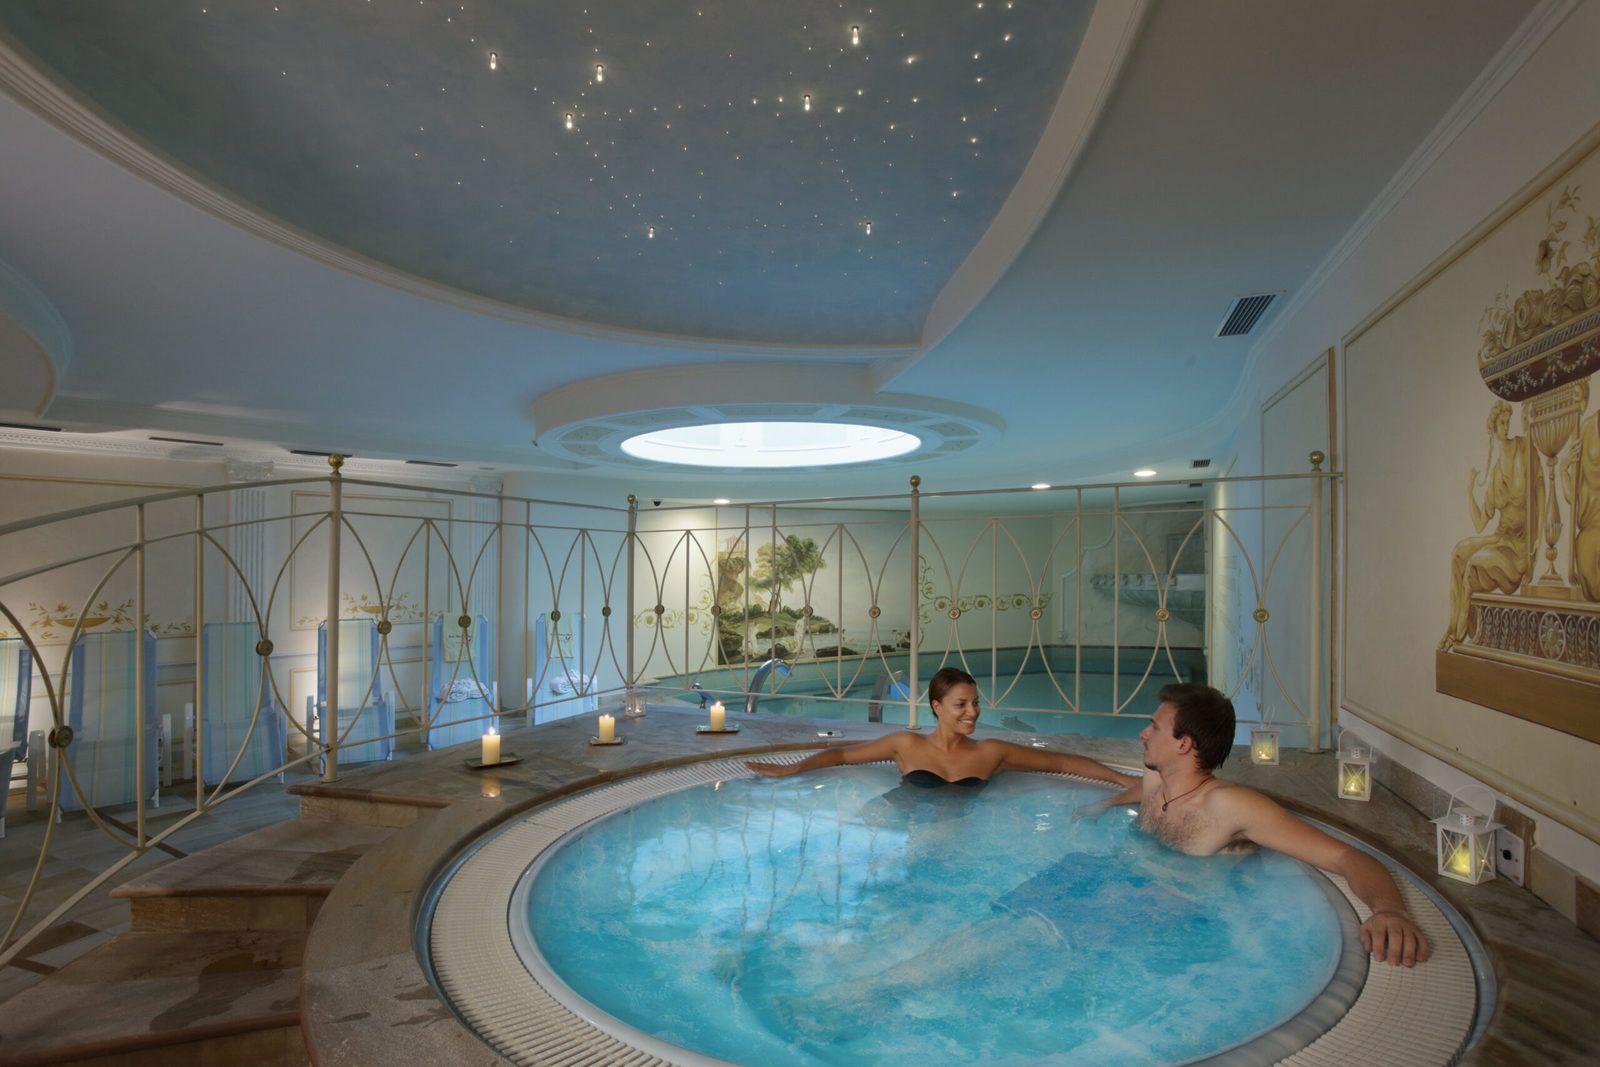 Hotel Cavallino la vasca idromassaggio